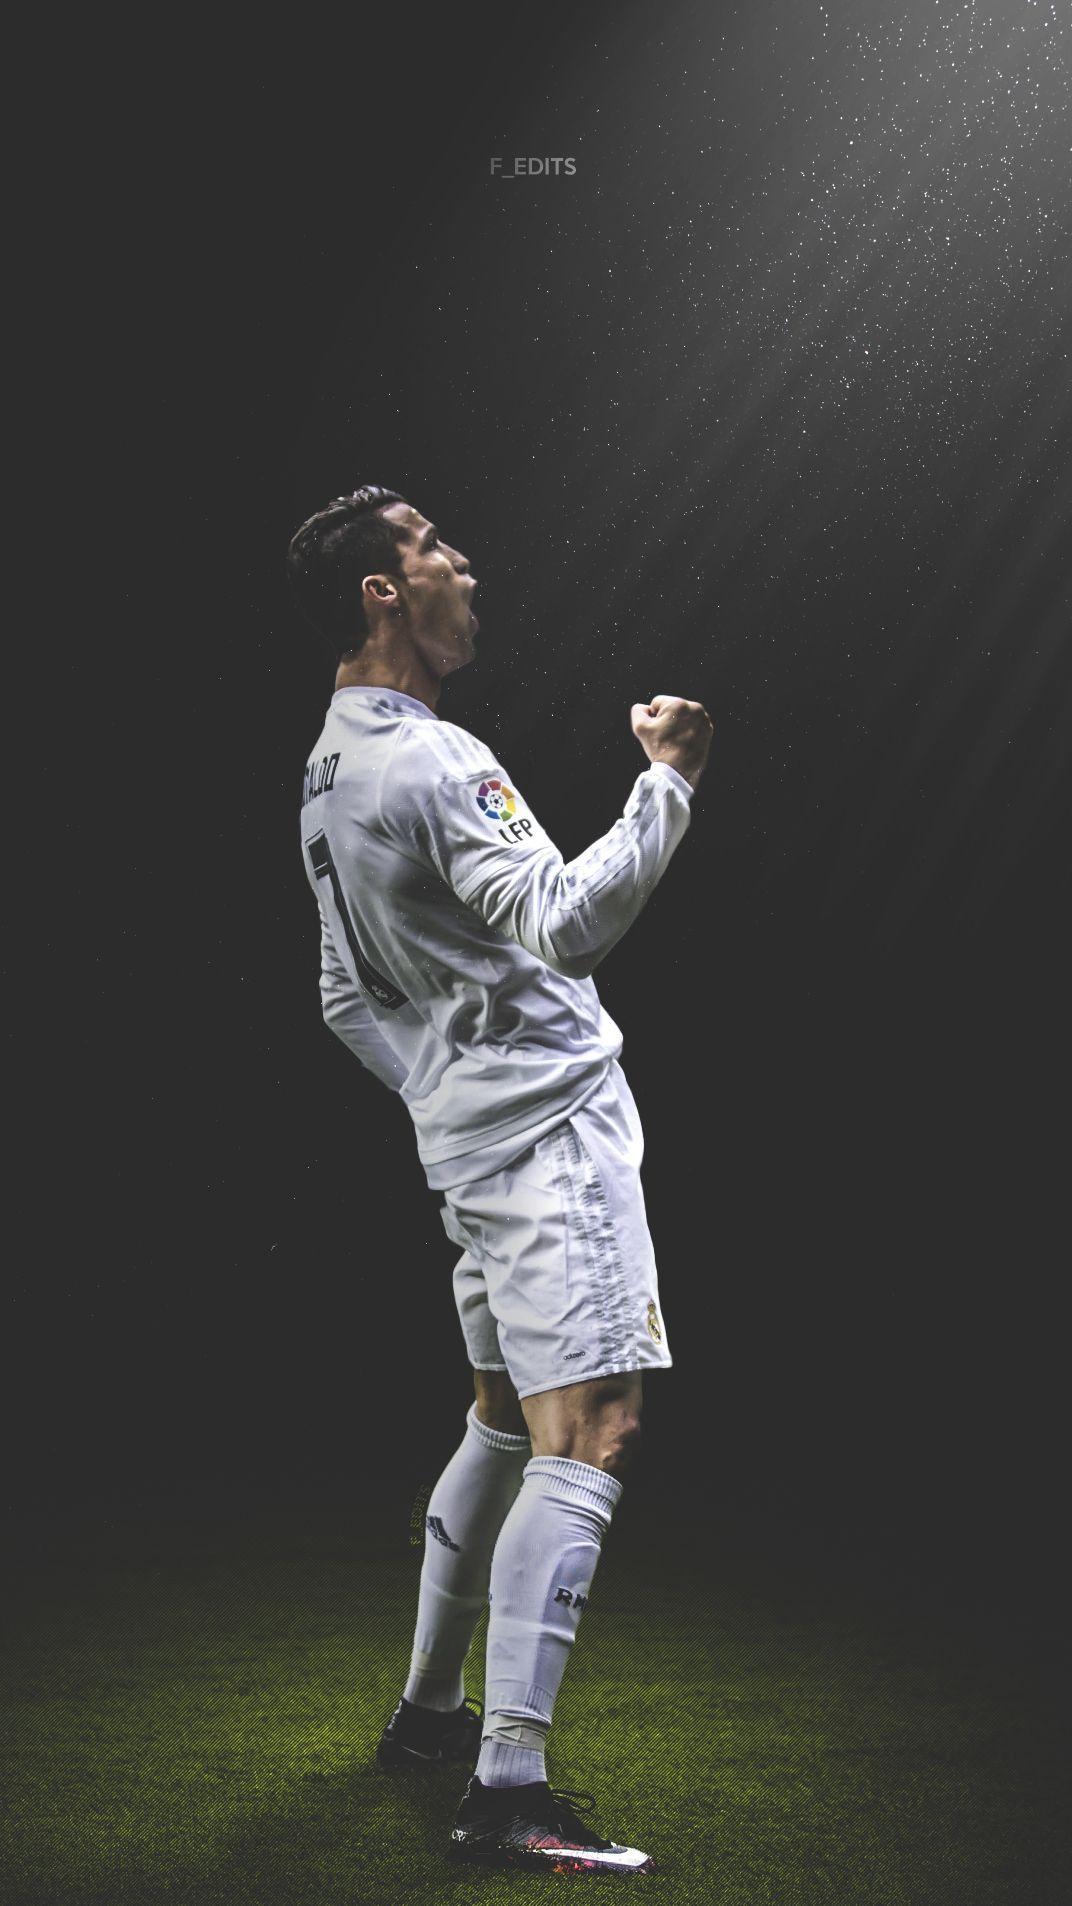 Pin By Alfredo Bejarano On Cristiano Ronaldo Cristiano Ronaldo Ronaldo Real Madrid Cristiano Ronaldo Juventus